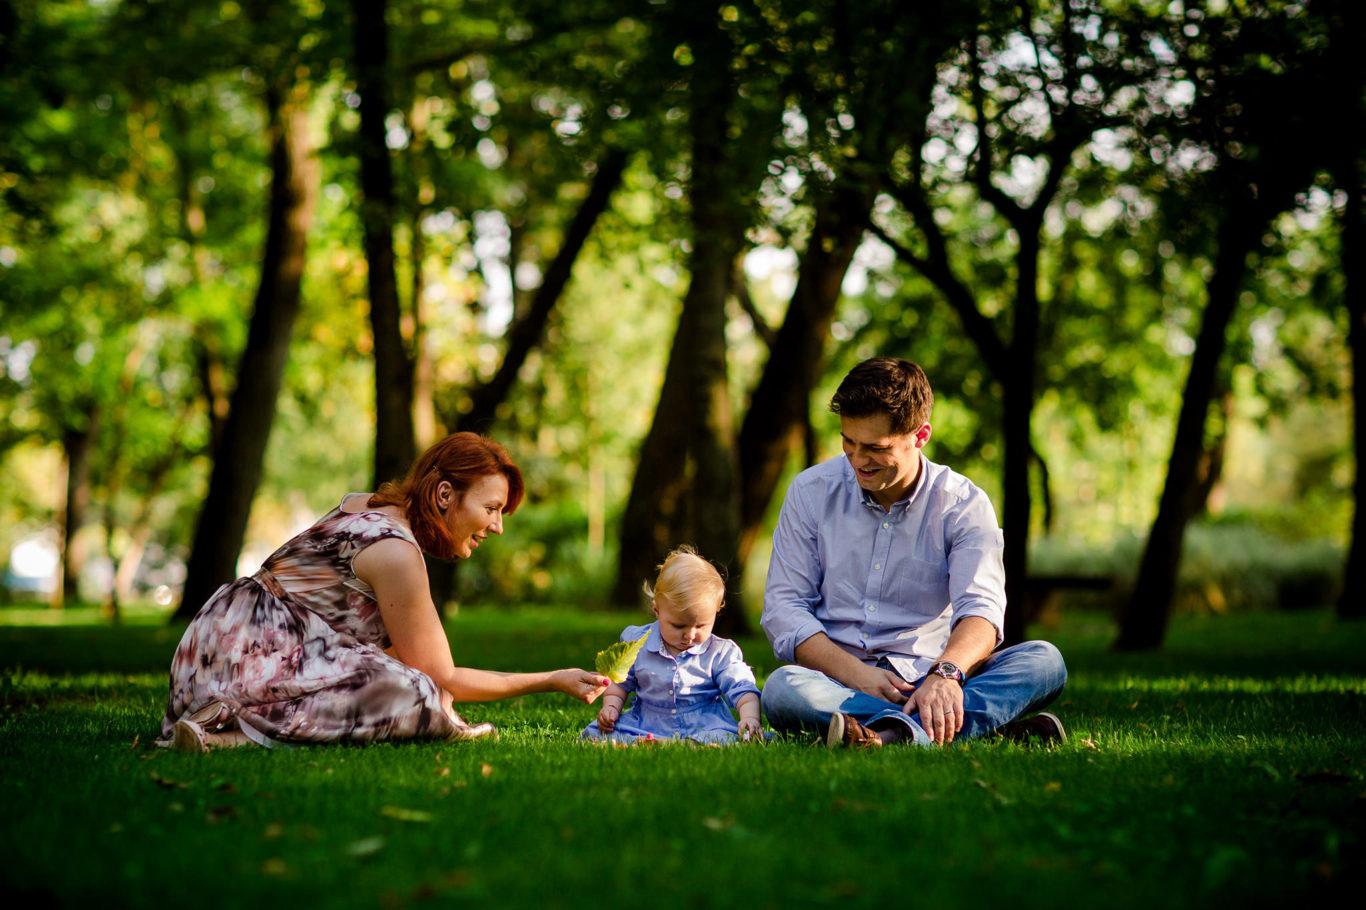 0061-fotografie-familie-ingrid-geta-mihai-ciprian-dumitrescu-cd2_4680